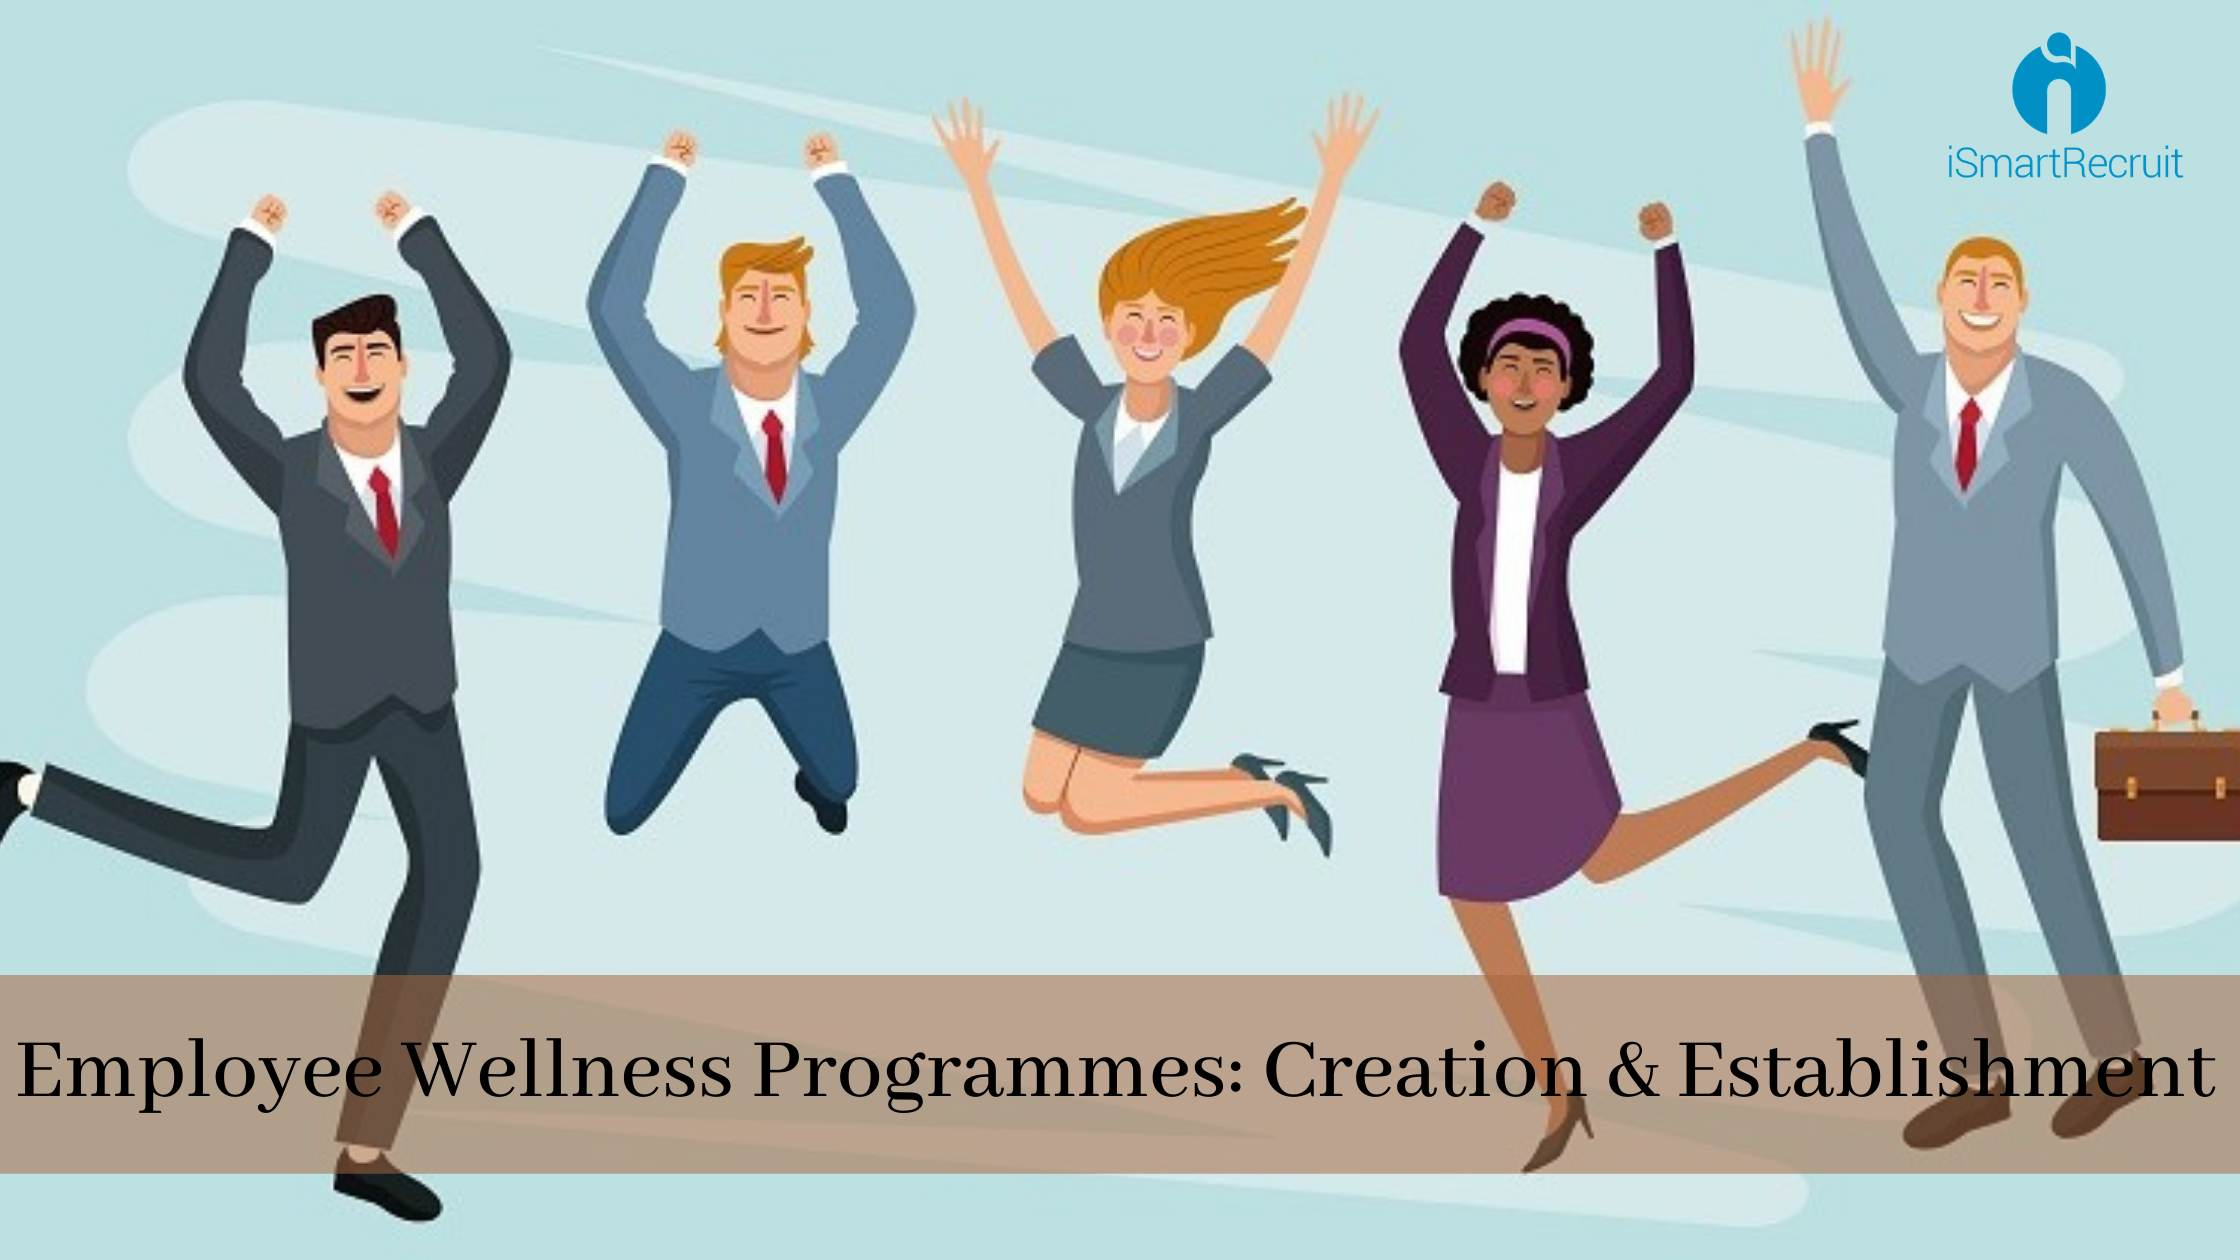 Employee Wellness Programmes: Creation & Establishment